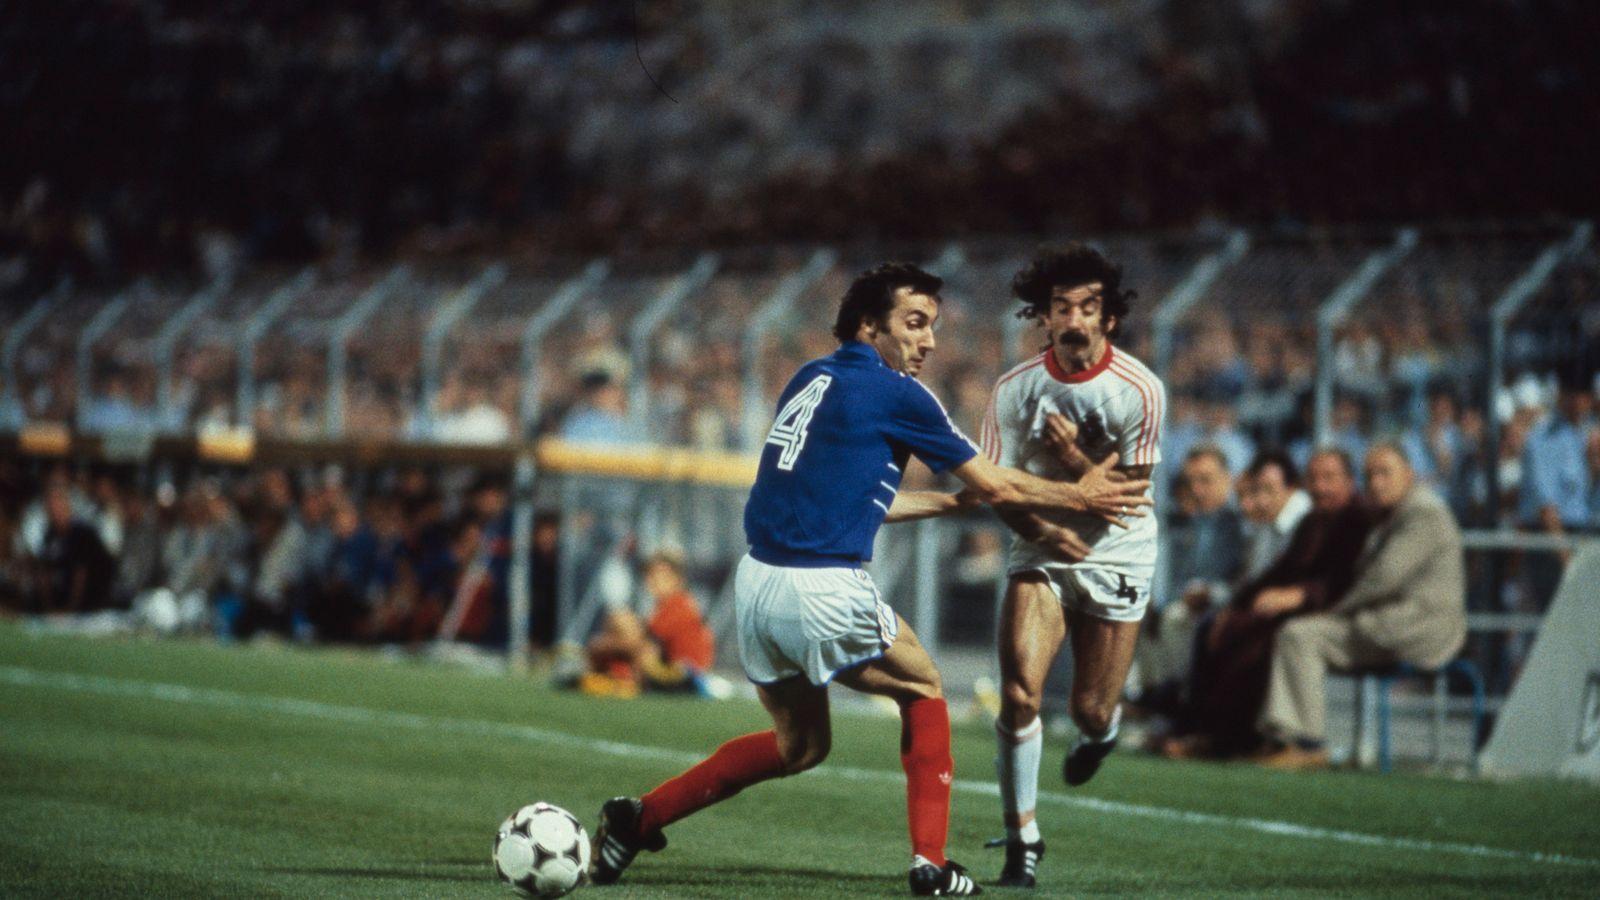 idokapszula_1984_franciaorszagi_labdarugo_europa-bajnoksag_elodontok_es_a_donto_franciaorszag_portugalia_maxim_bossis_fernando_chalana.jpg